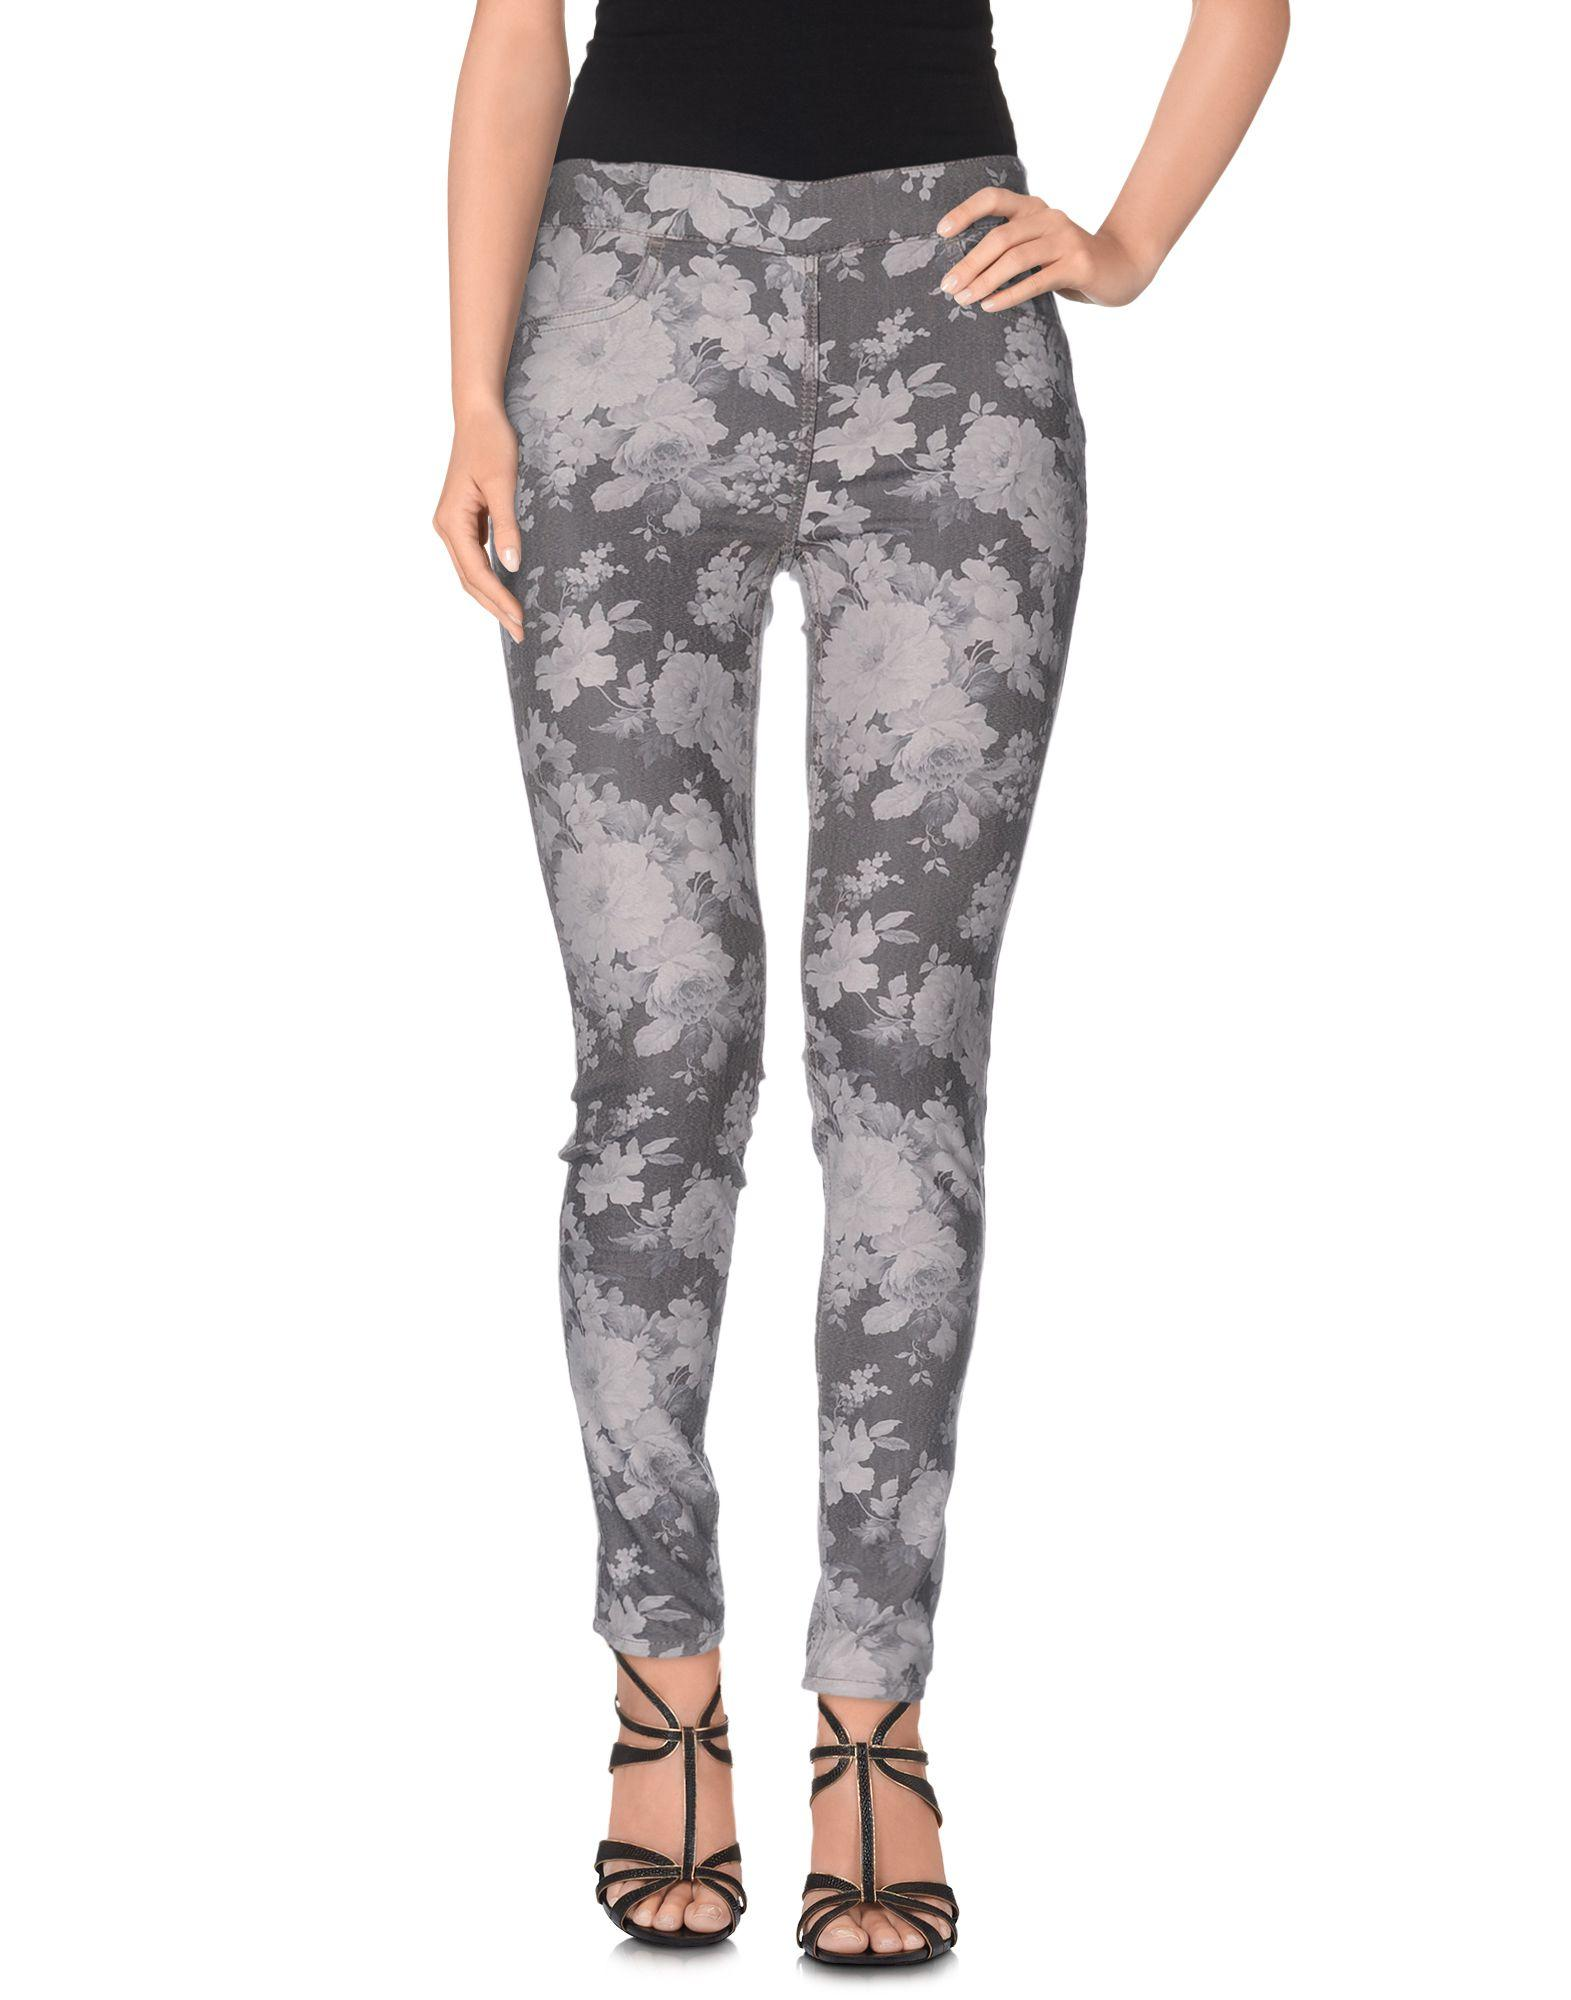 Liu •jo Denim Pants In Grey